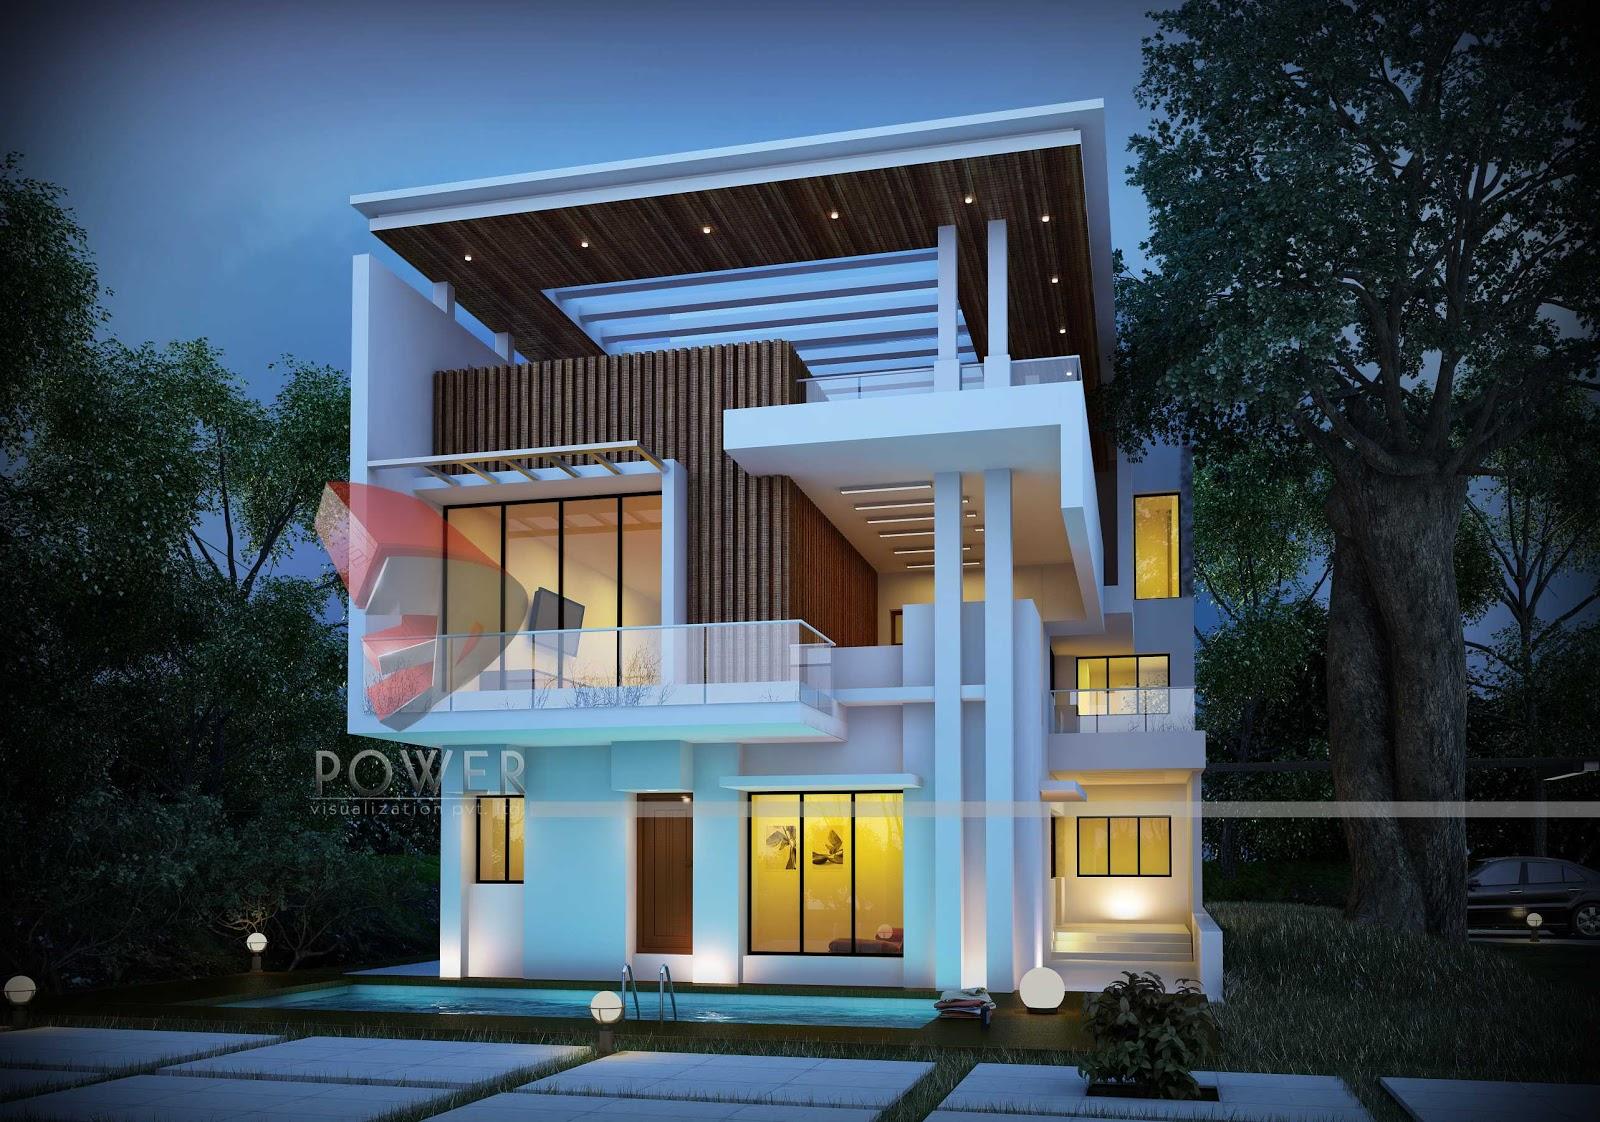 15 Remarkable Modern House Designs Home Design Lover DESIGNS HOUSE